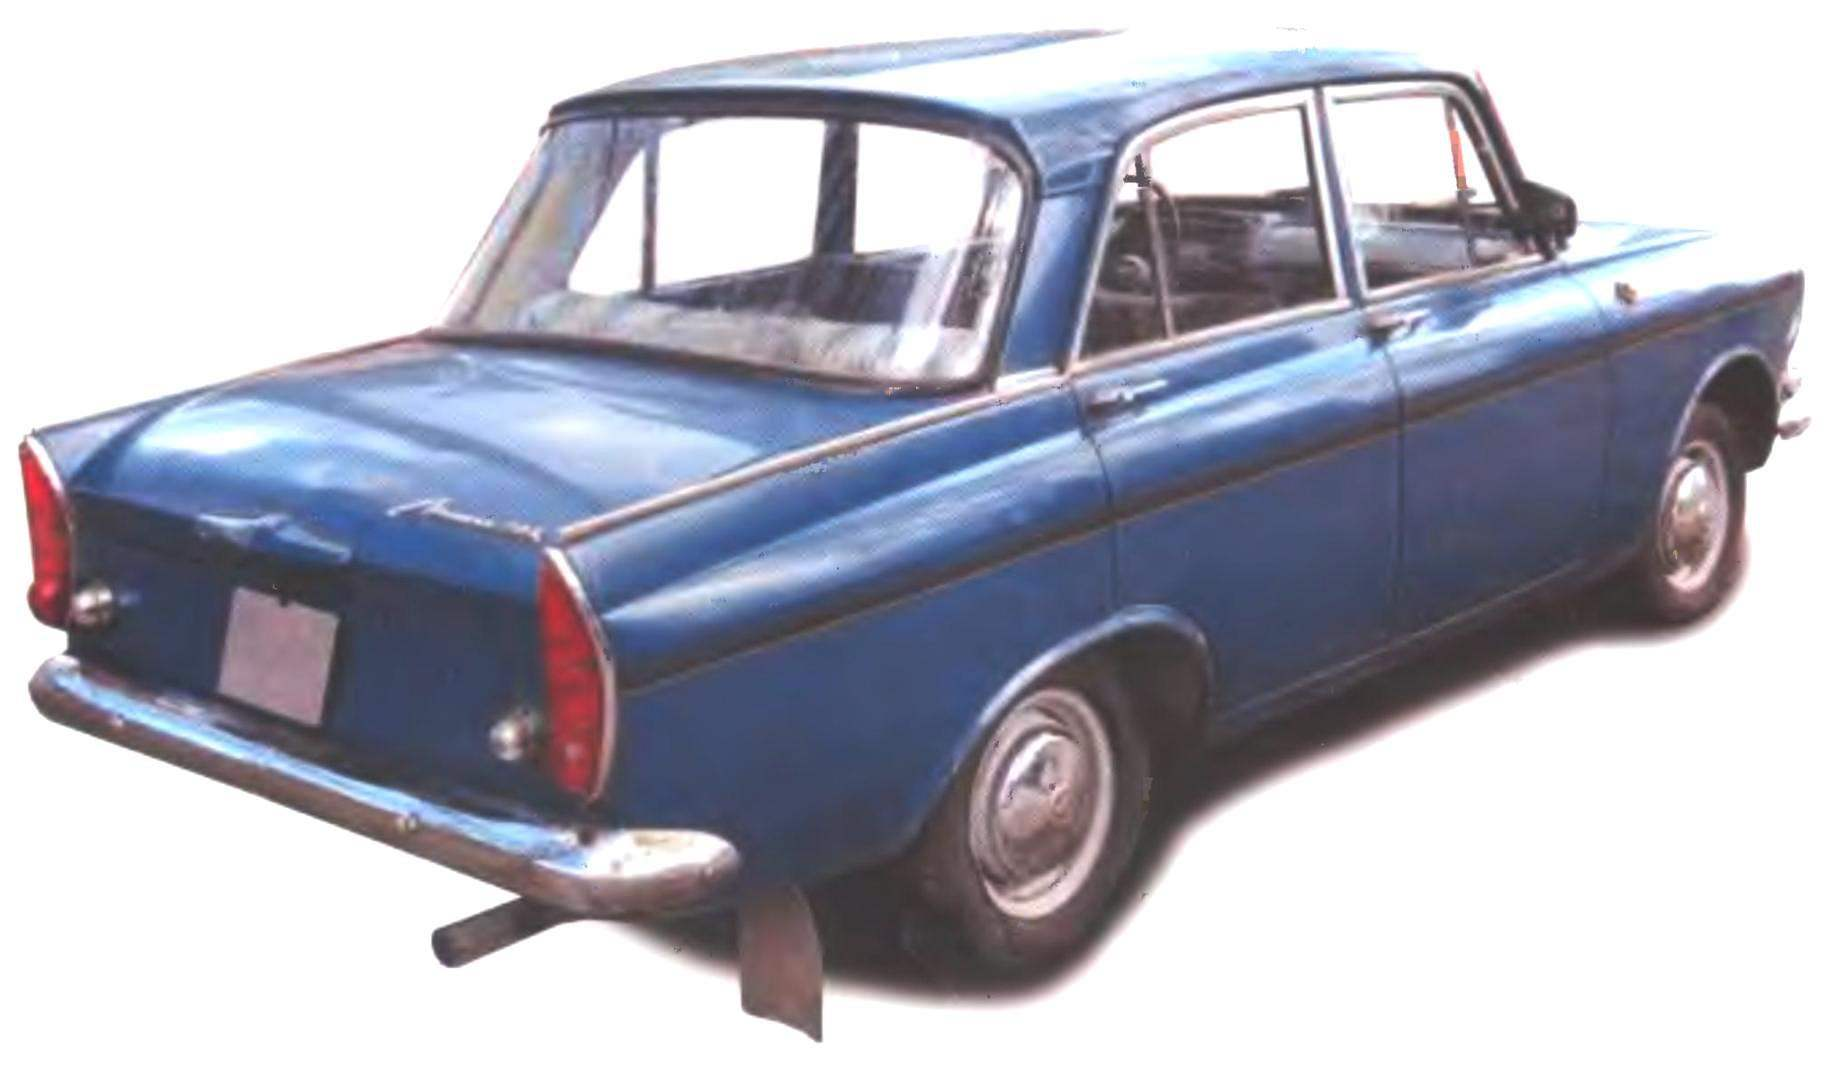 АВТОМОБИЛЬ «МОСКВИЧ-408»